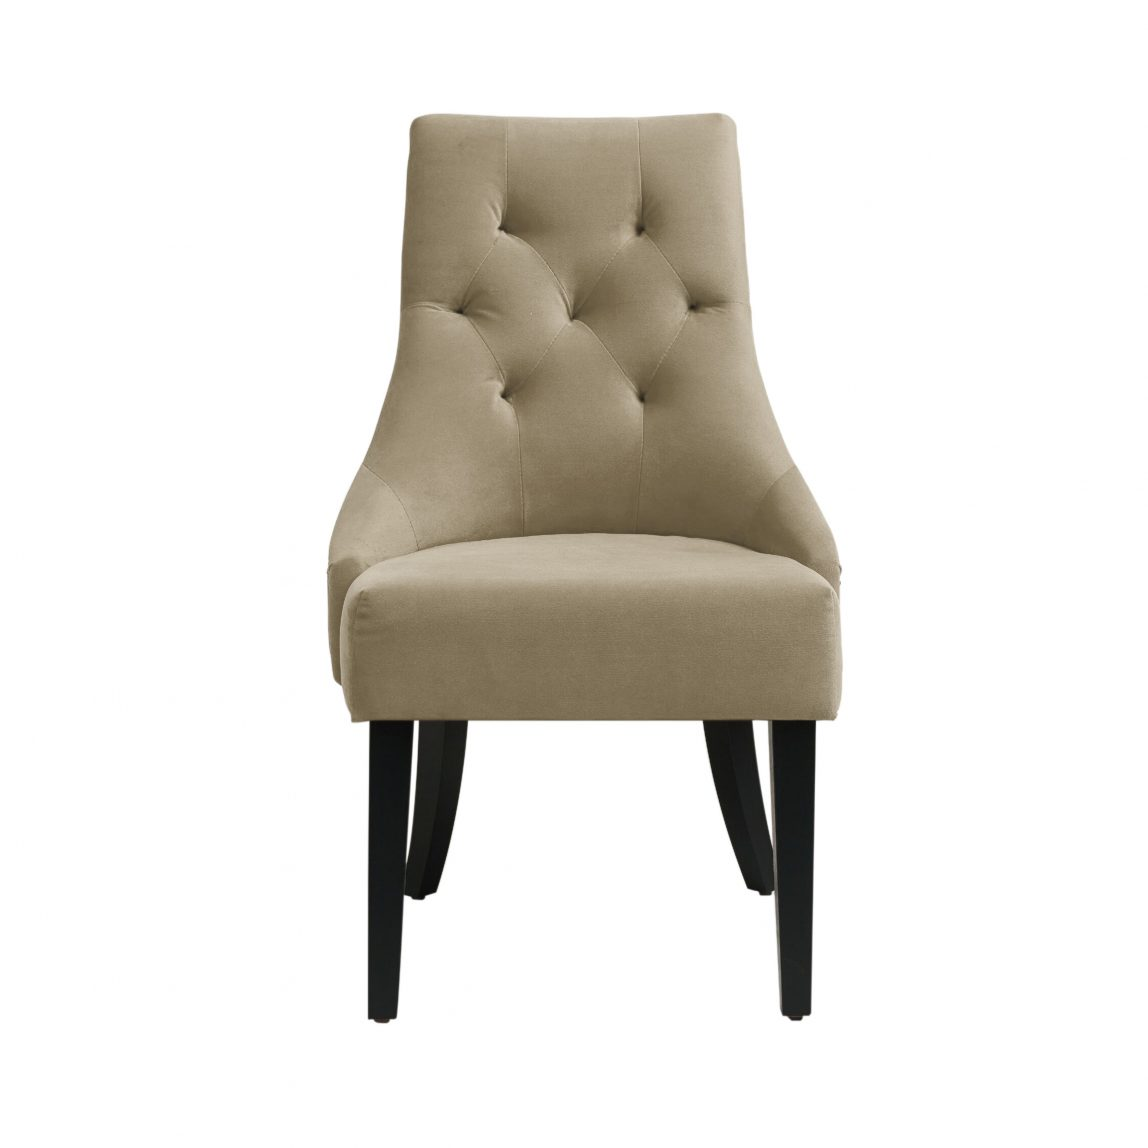 Дизайнерский стул baker bayron байрон арт-деко бежевый с капитоне